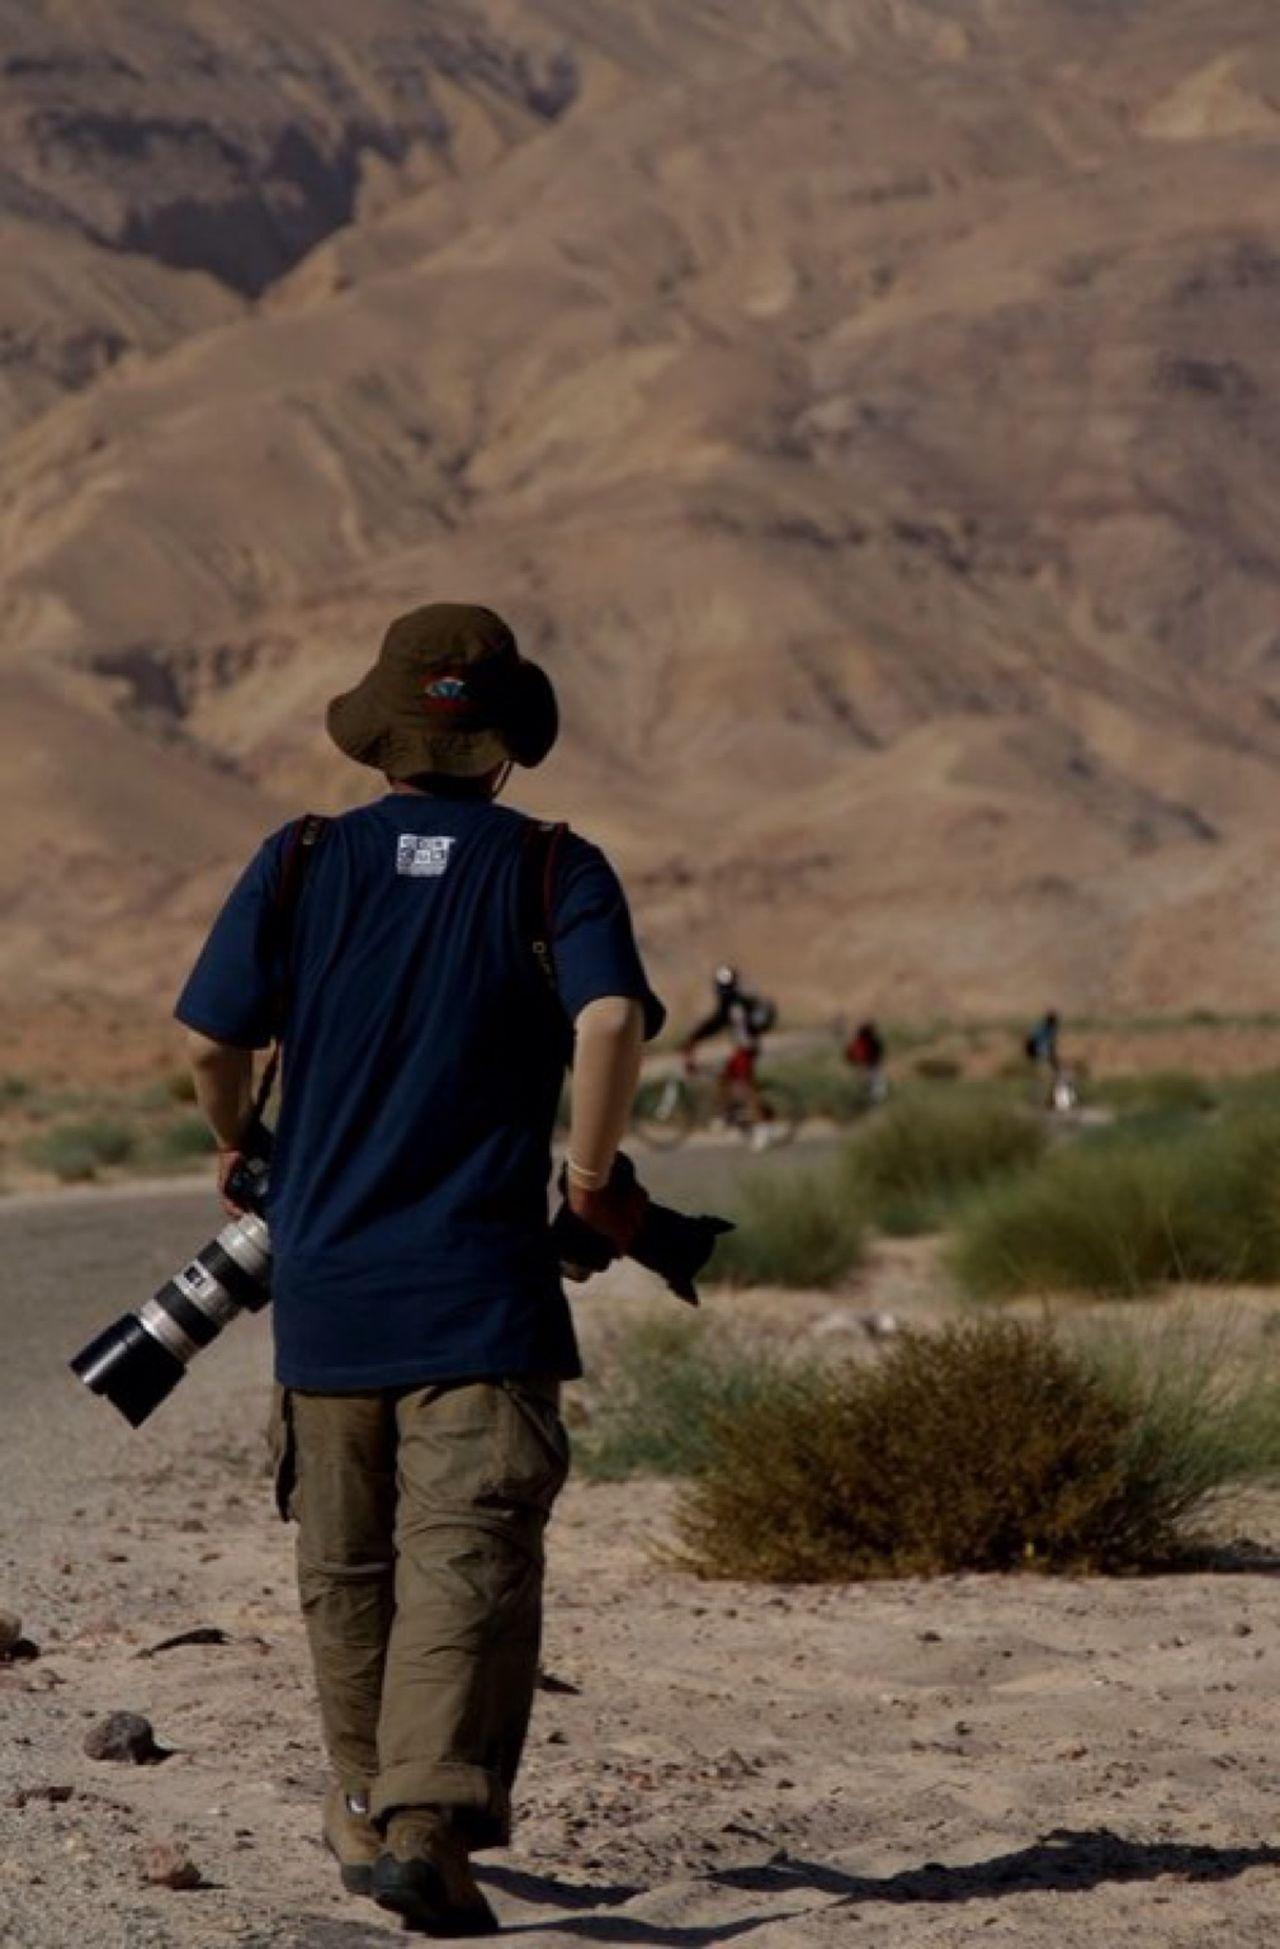 masa lalu Desert Jordan Cycling Photographer